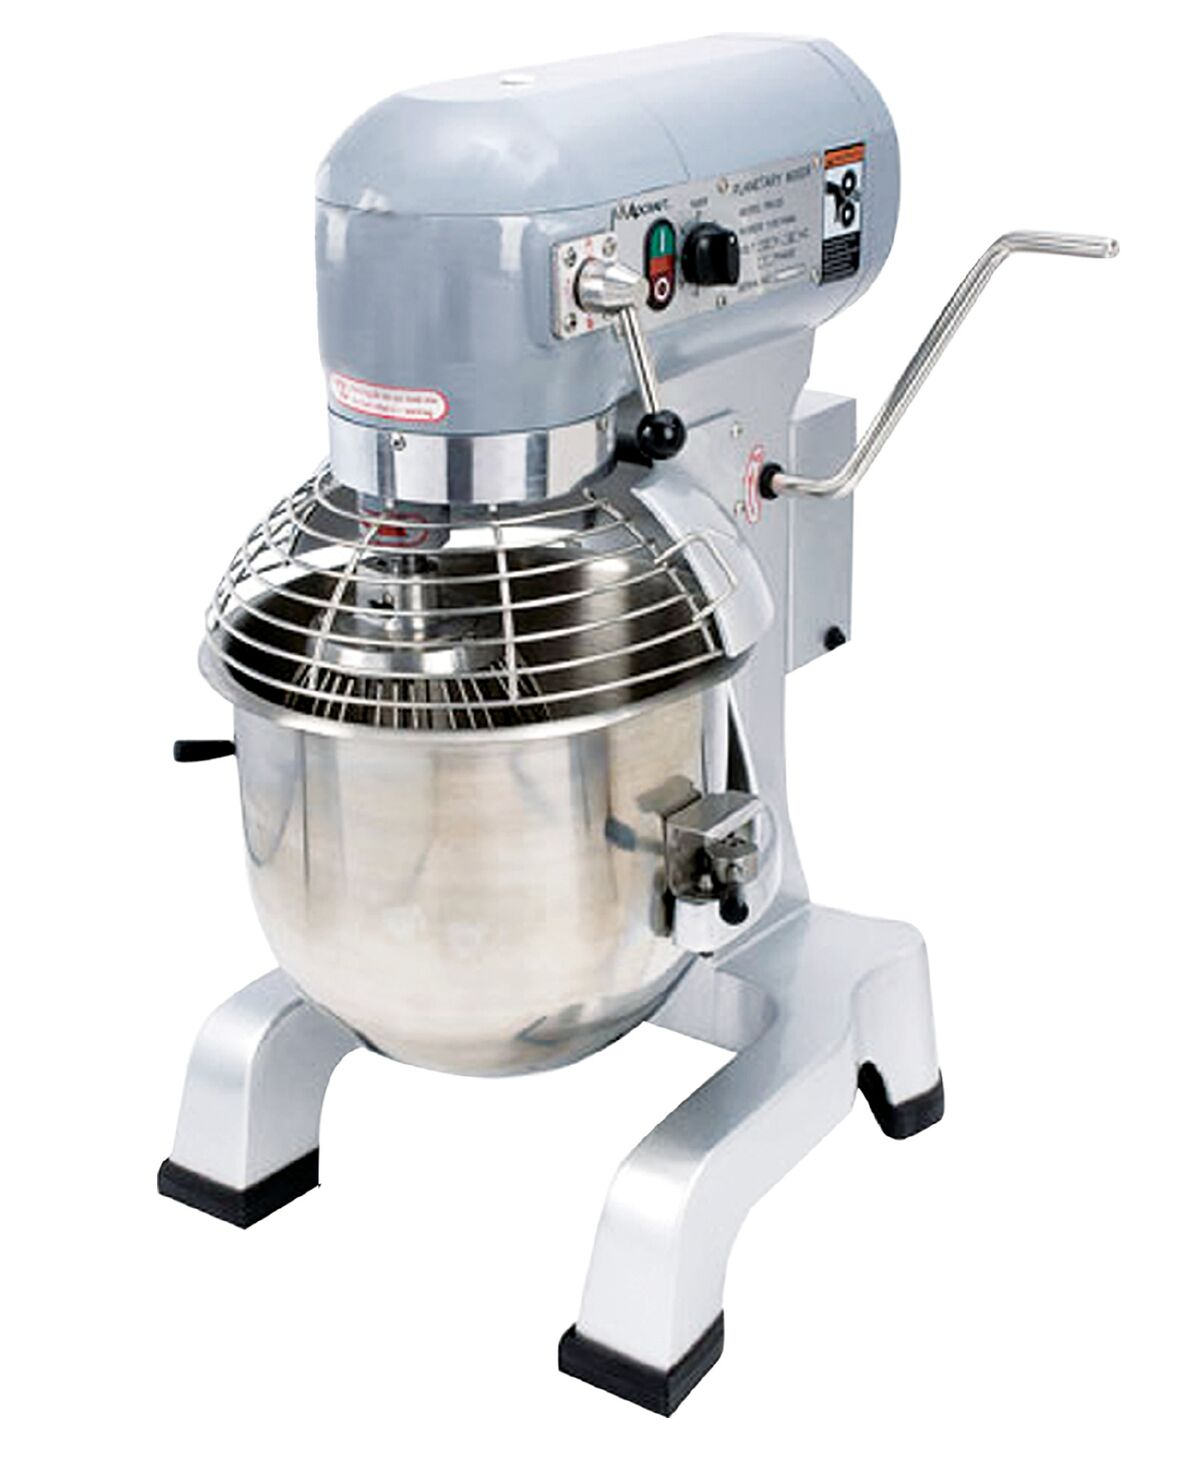 Admiral Craft BDPM-10 planetary mixer